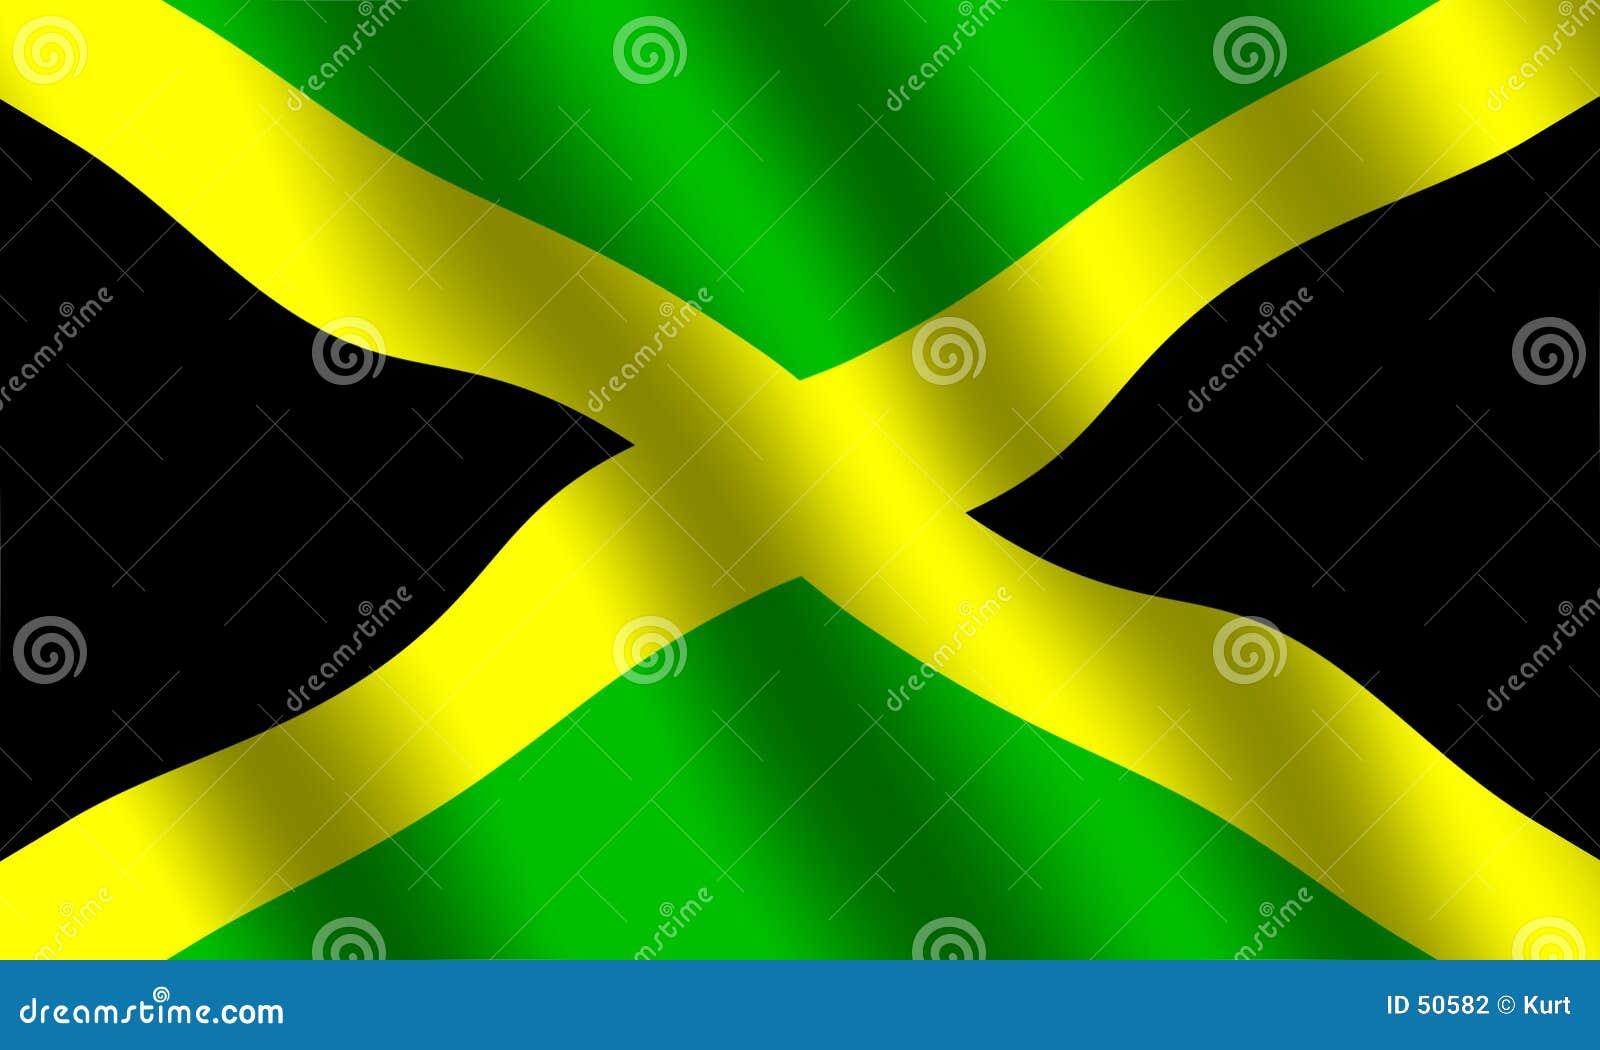 Download Indicateur jamaïquain illustration stock. Illustration du cordon - 50582